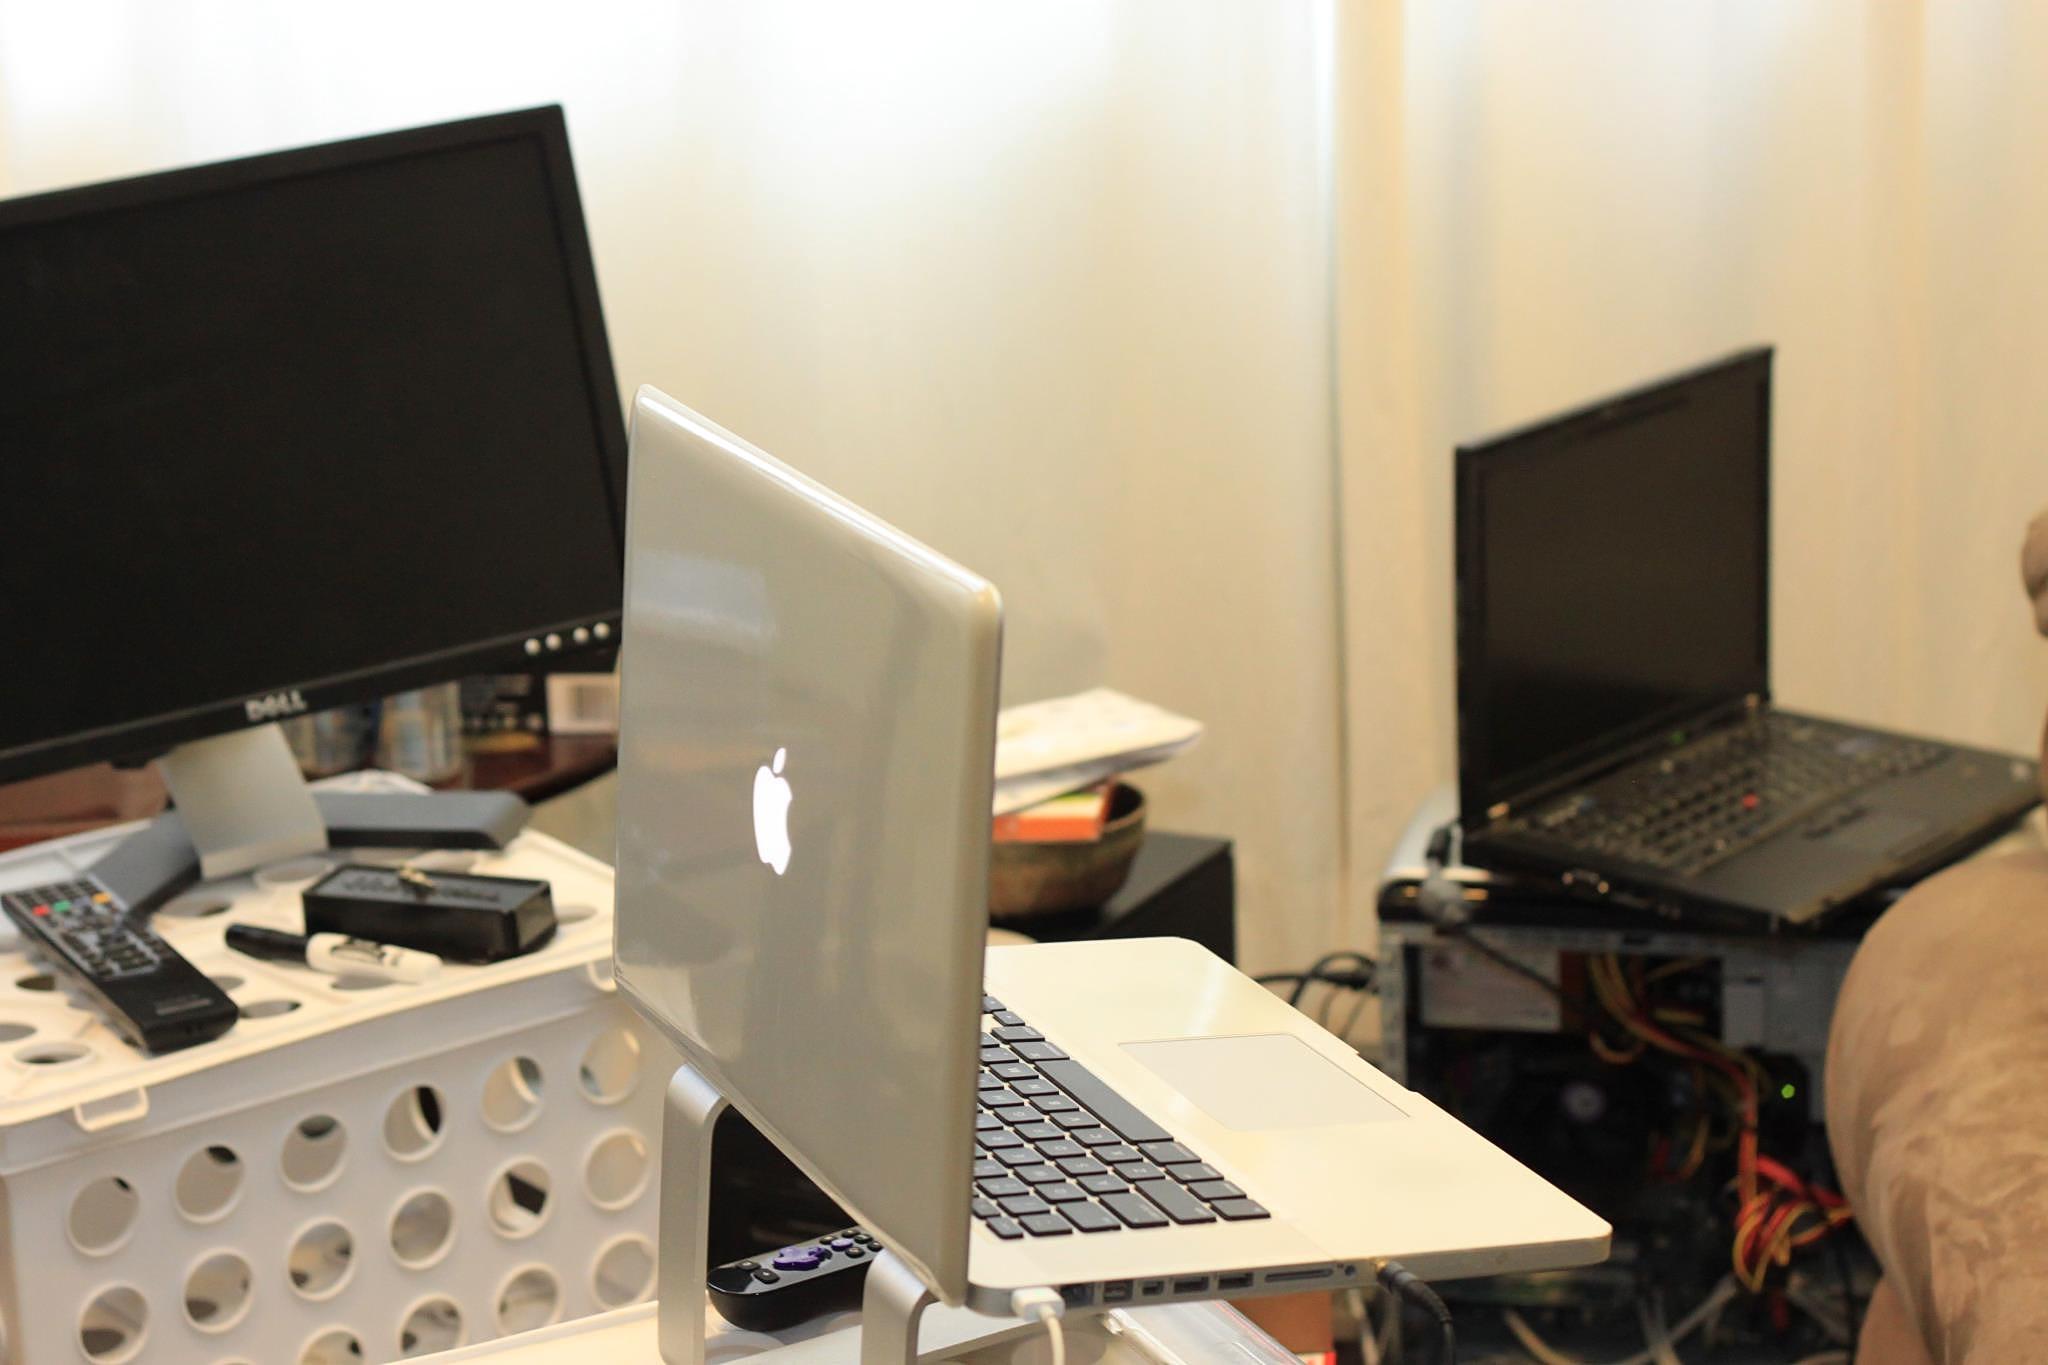 triple laptop data Transfer Nerdslimited-NN.com.jpg